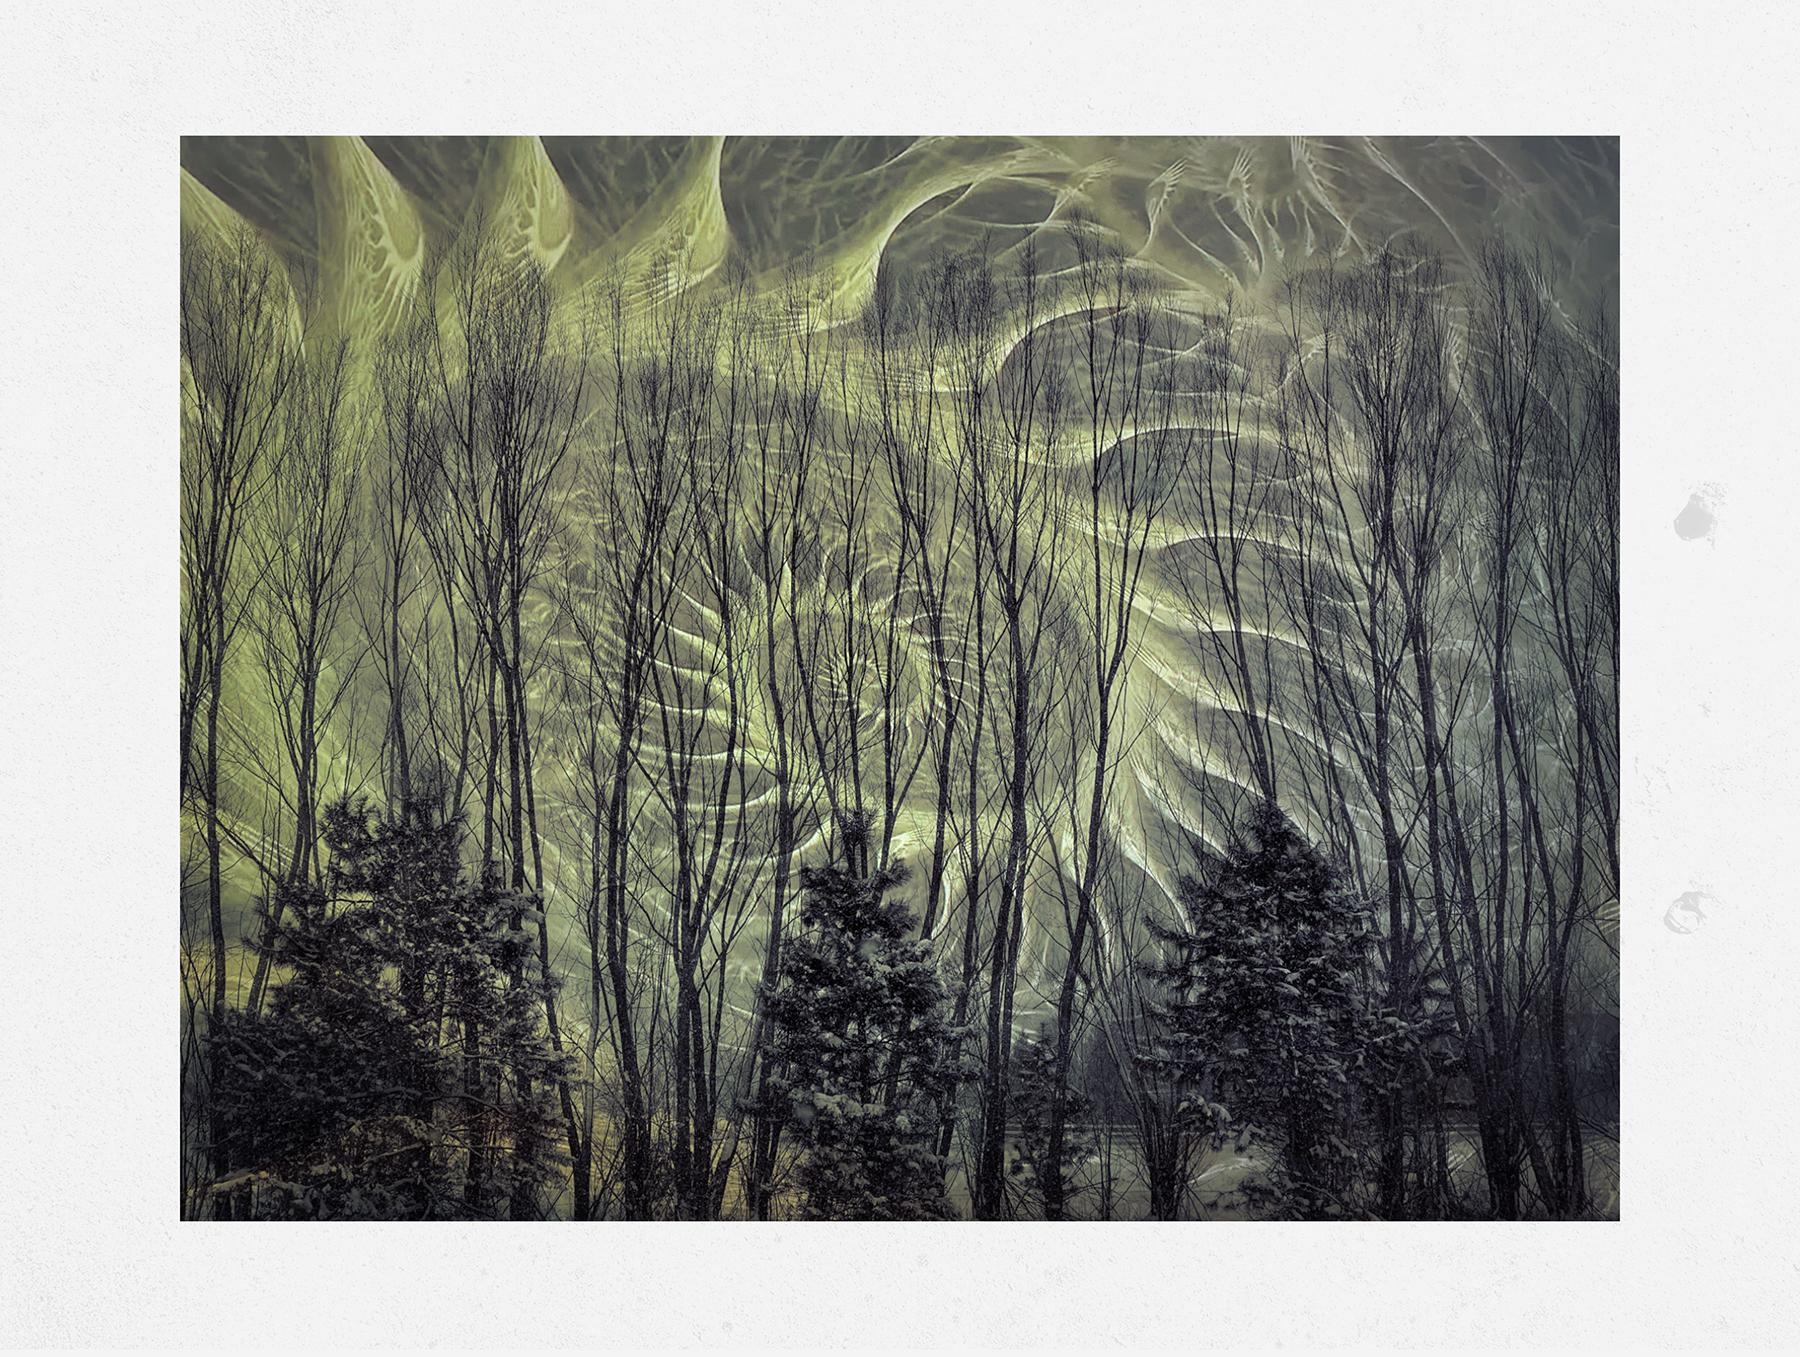 Kate_ZariRoberts_Nature Fractals_Tree Fractal l_1.jpg